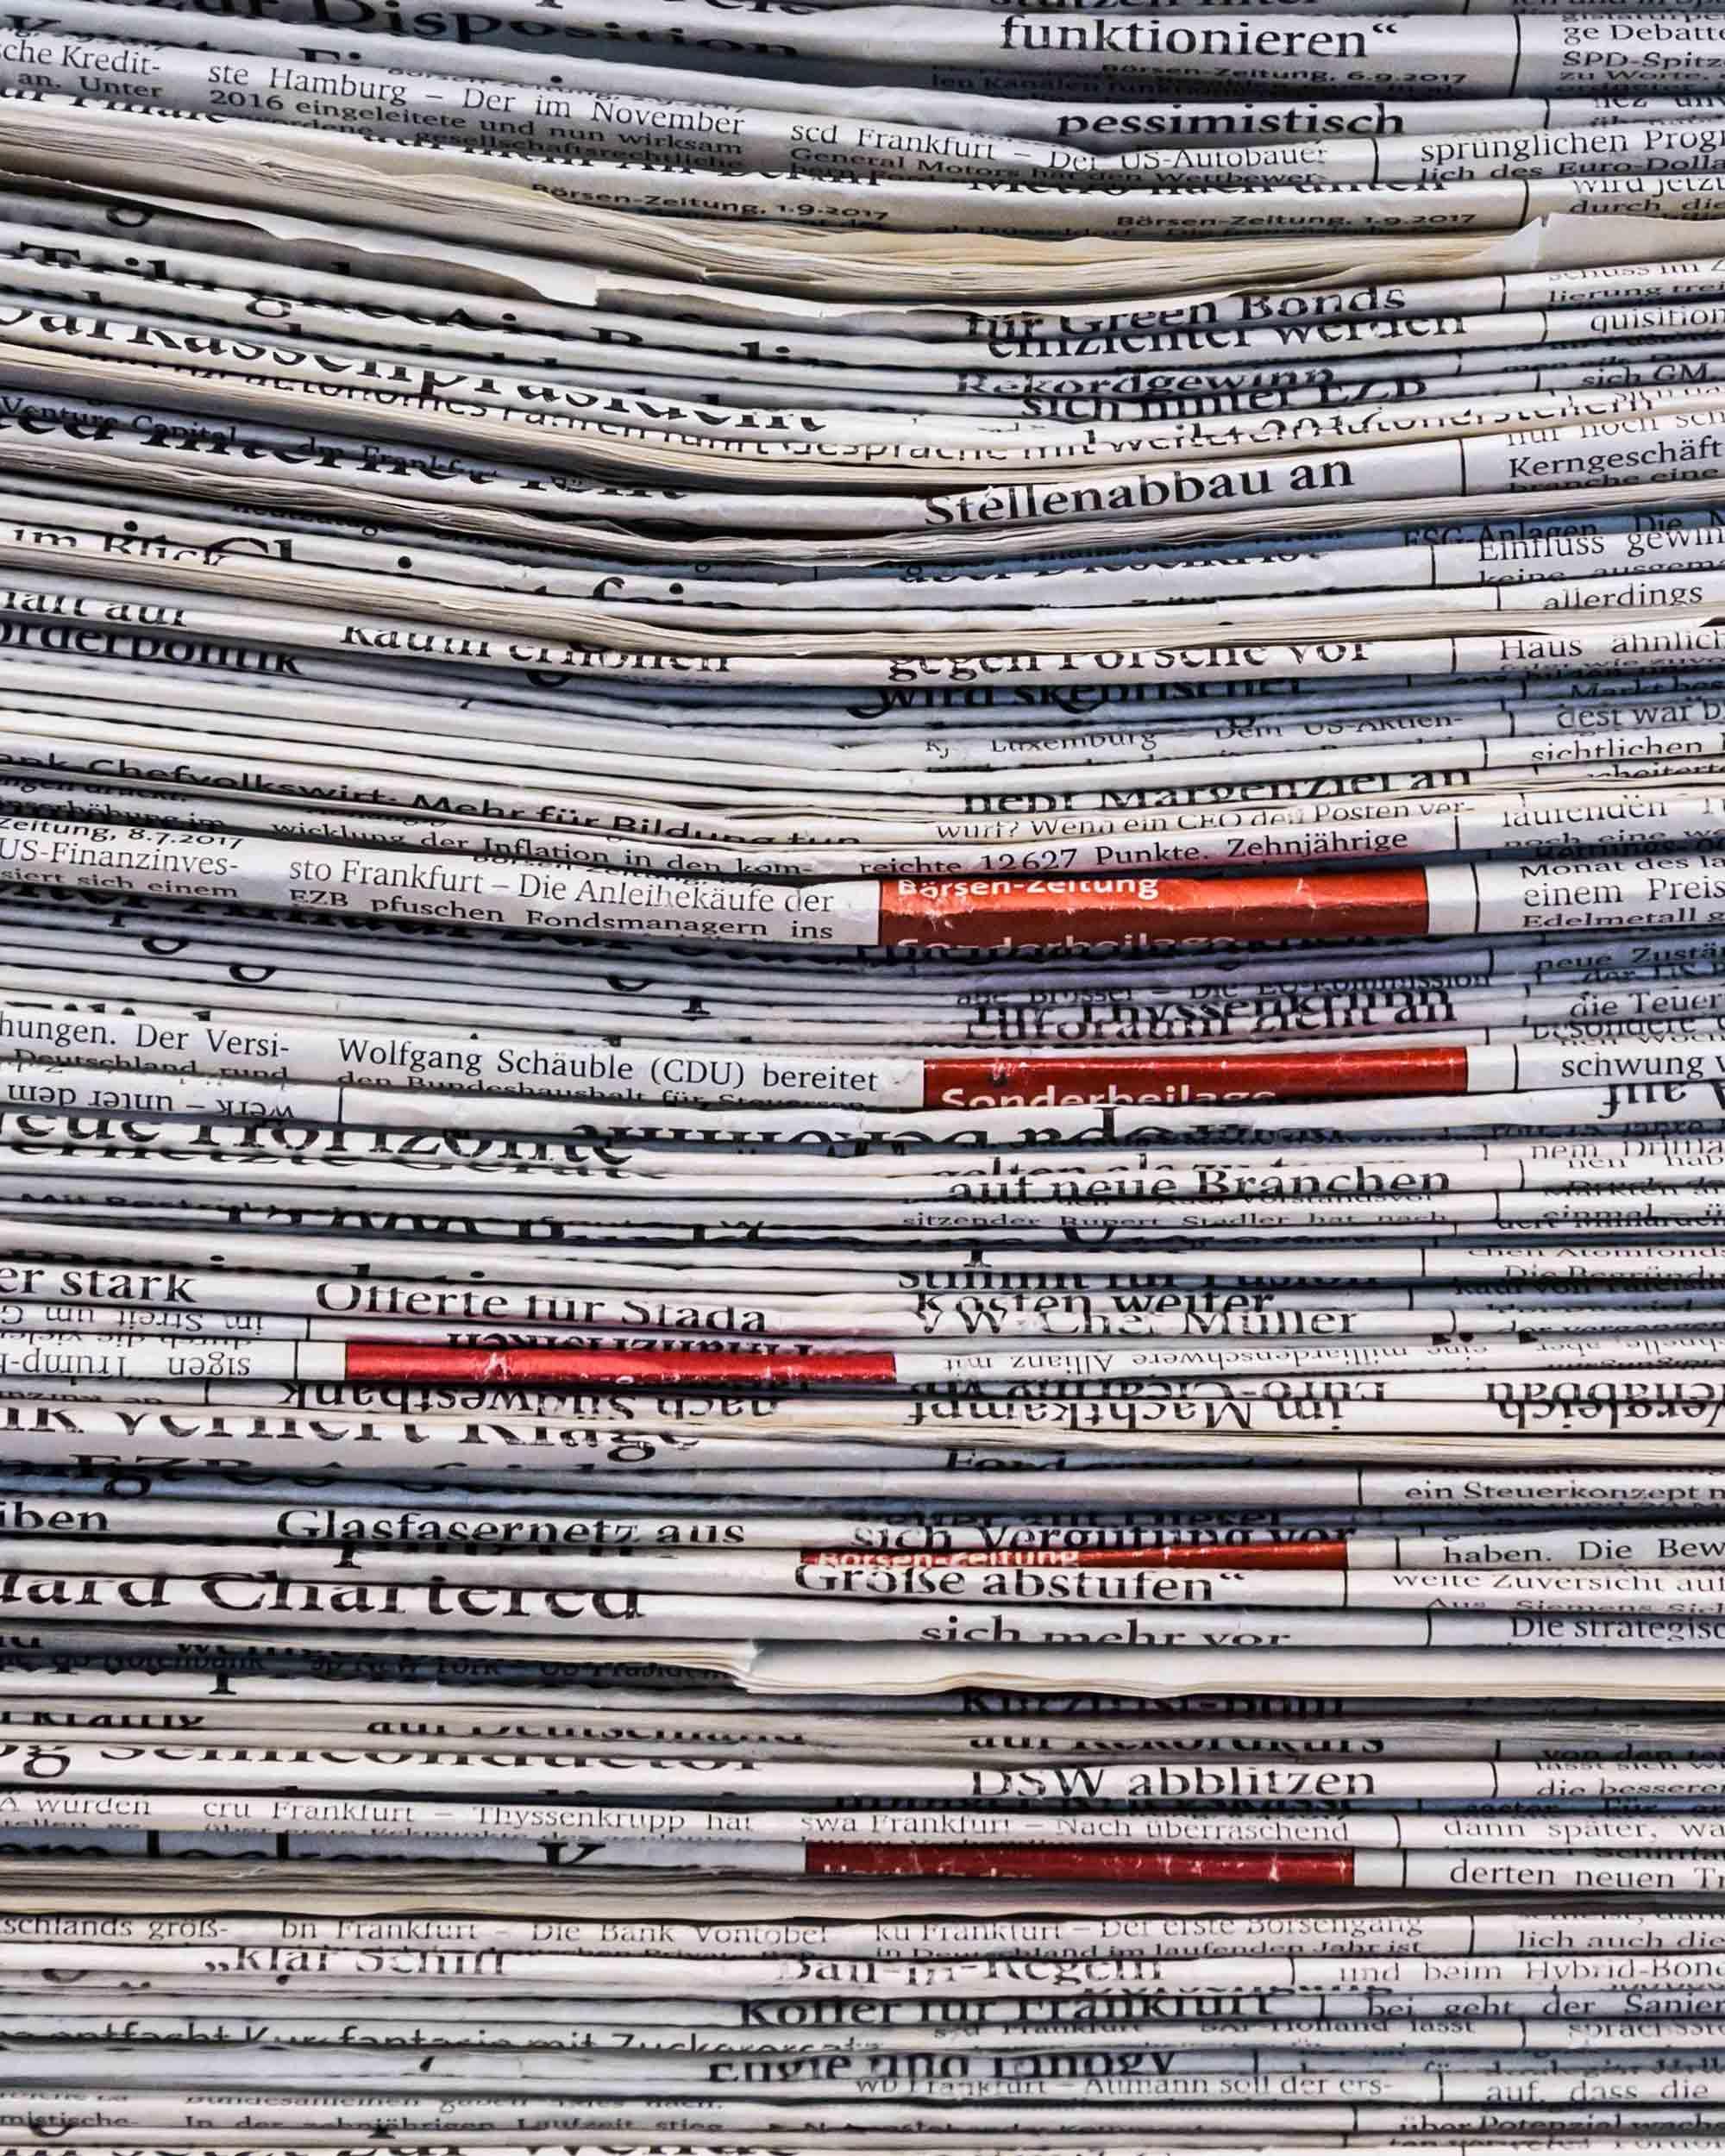 Media, Intellectual Property